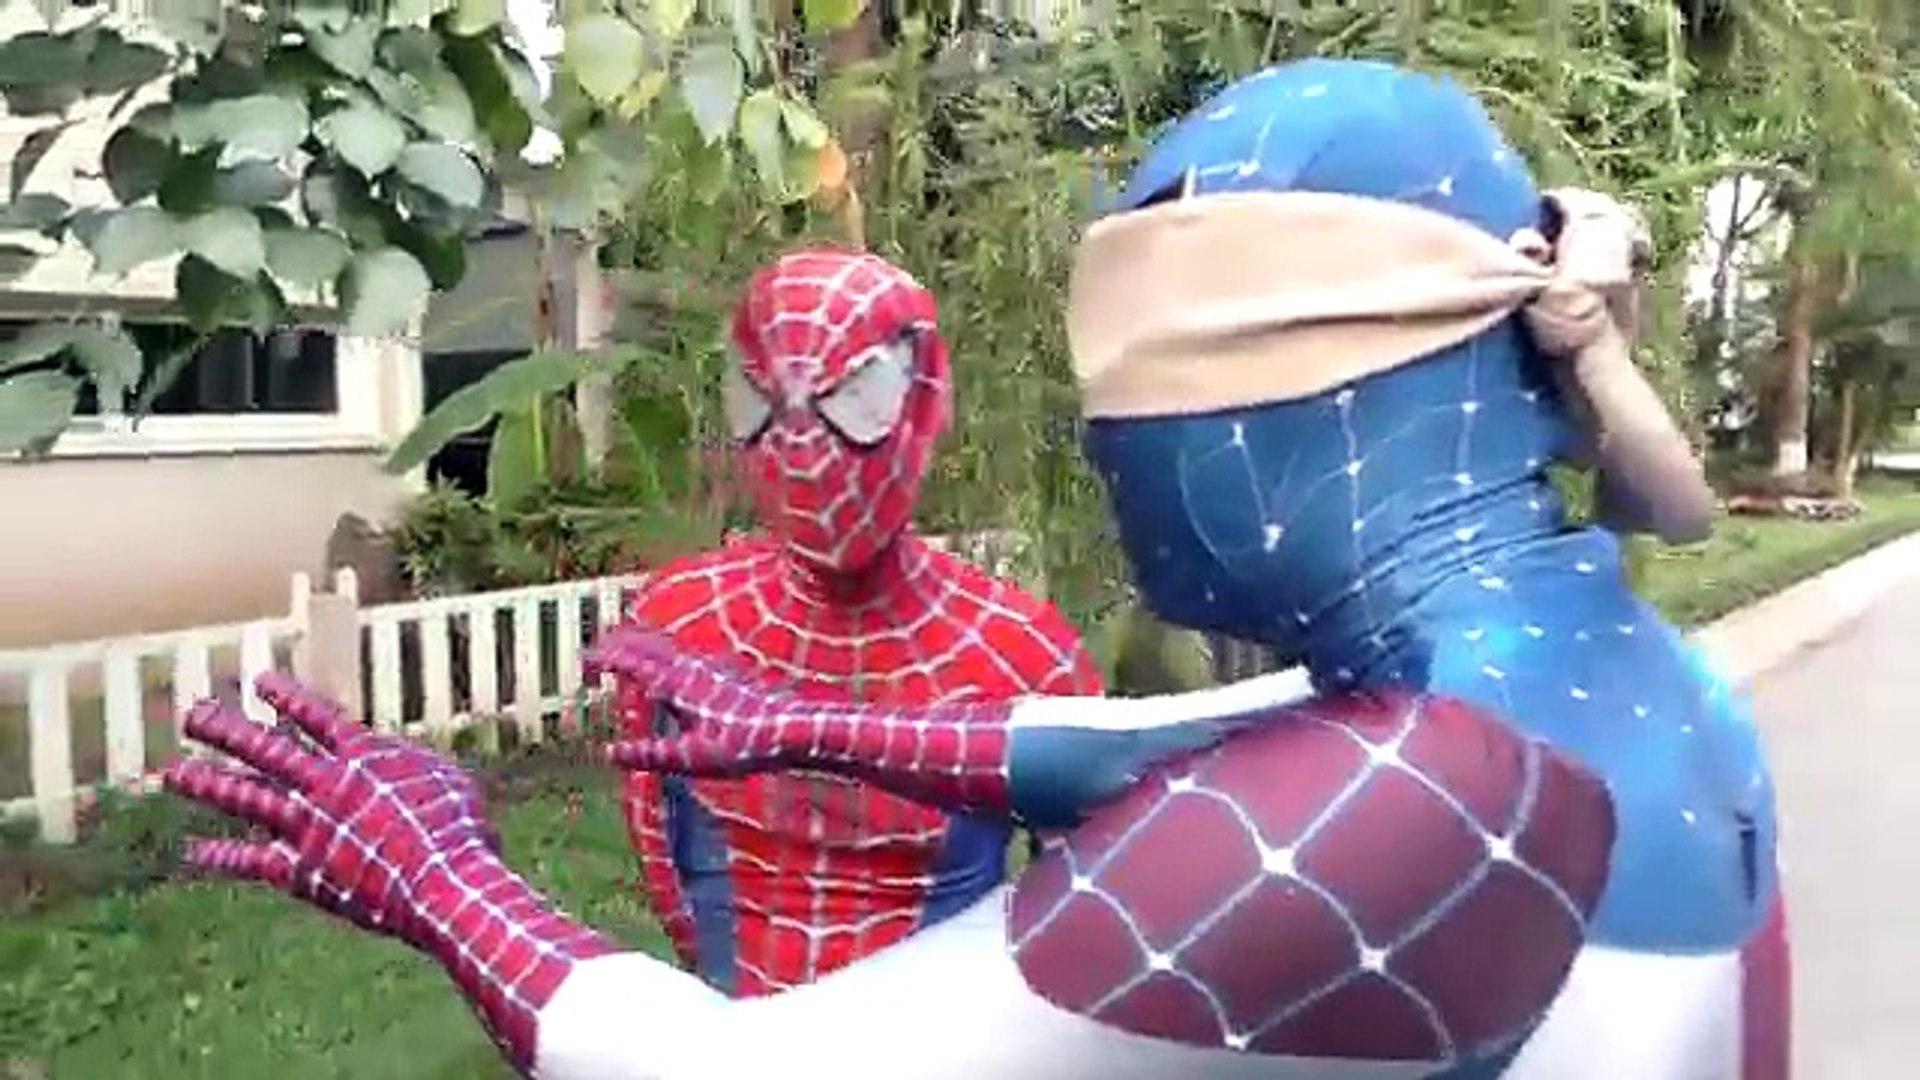 Spiderman CHASED by Monster Truck Attack!!! Venom Joker Hulk Captain America Children Action Movies